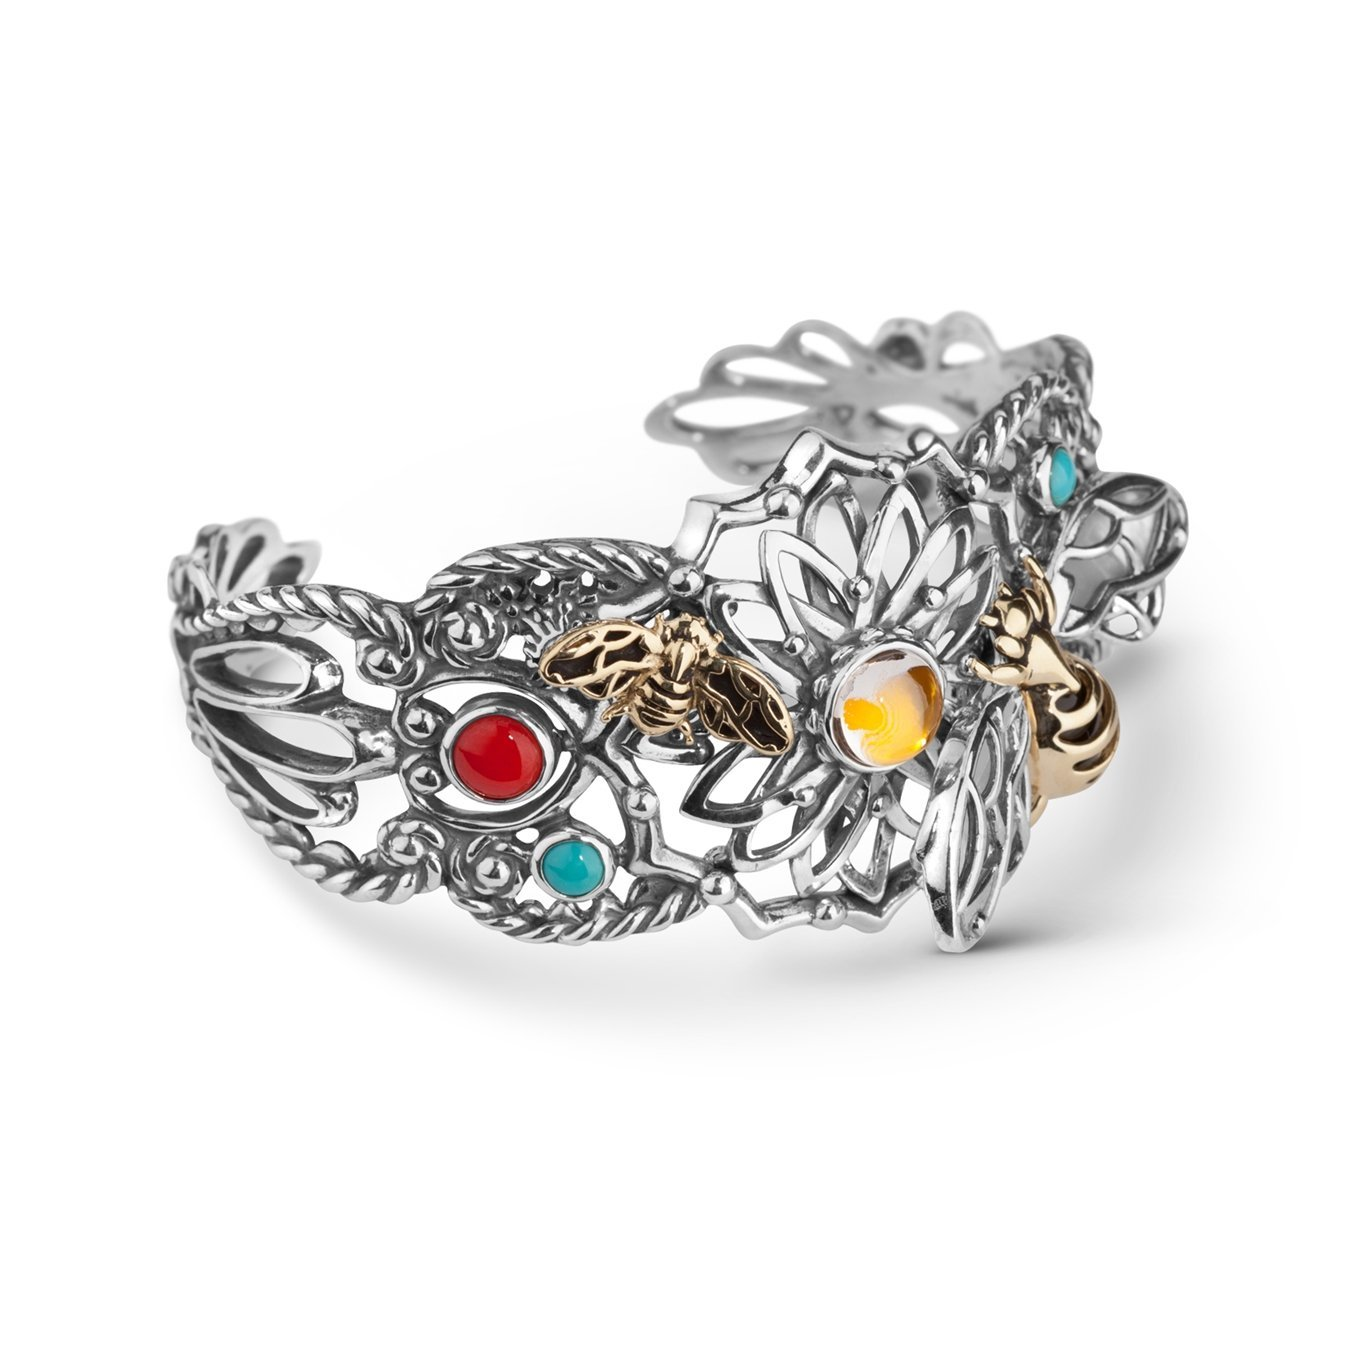 Fritz Casuse Mixed Metal Bumblebee Bracelet